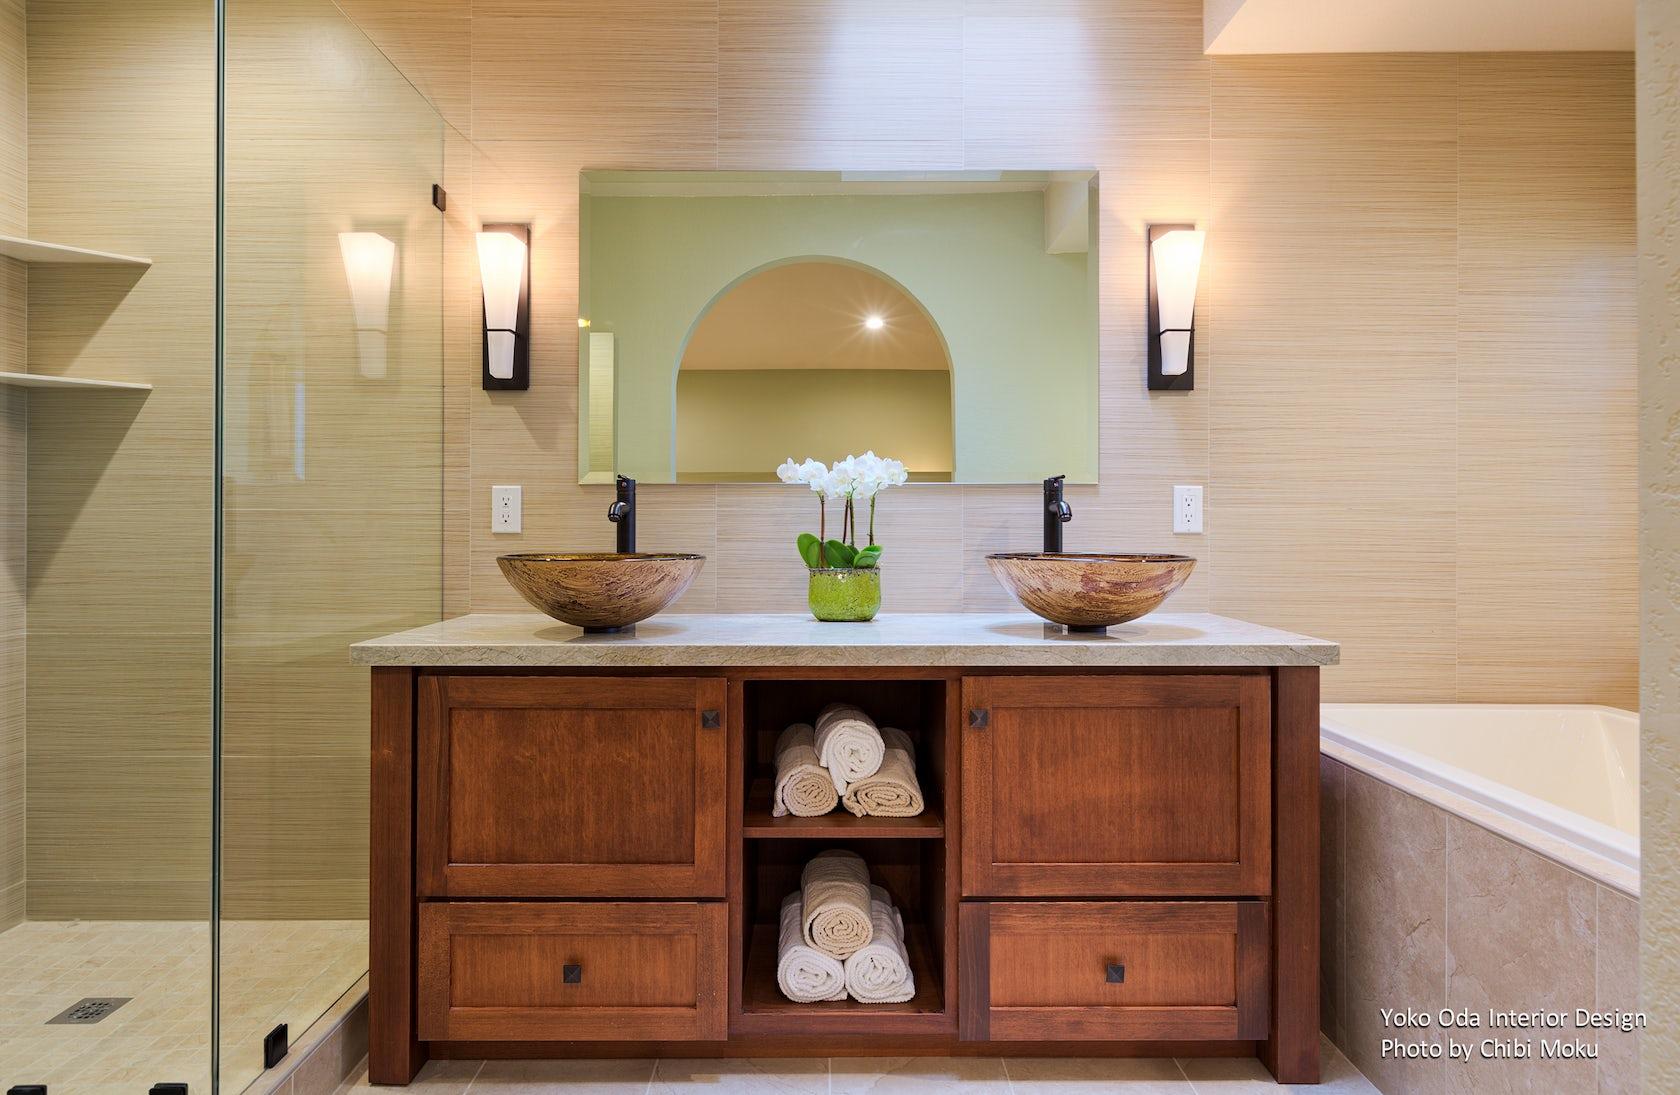 Yoko oda interior design zen bathroom effortless for Bath remodel walnut creek ca